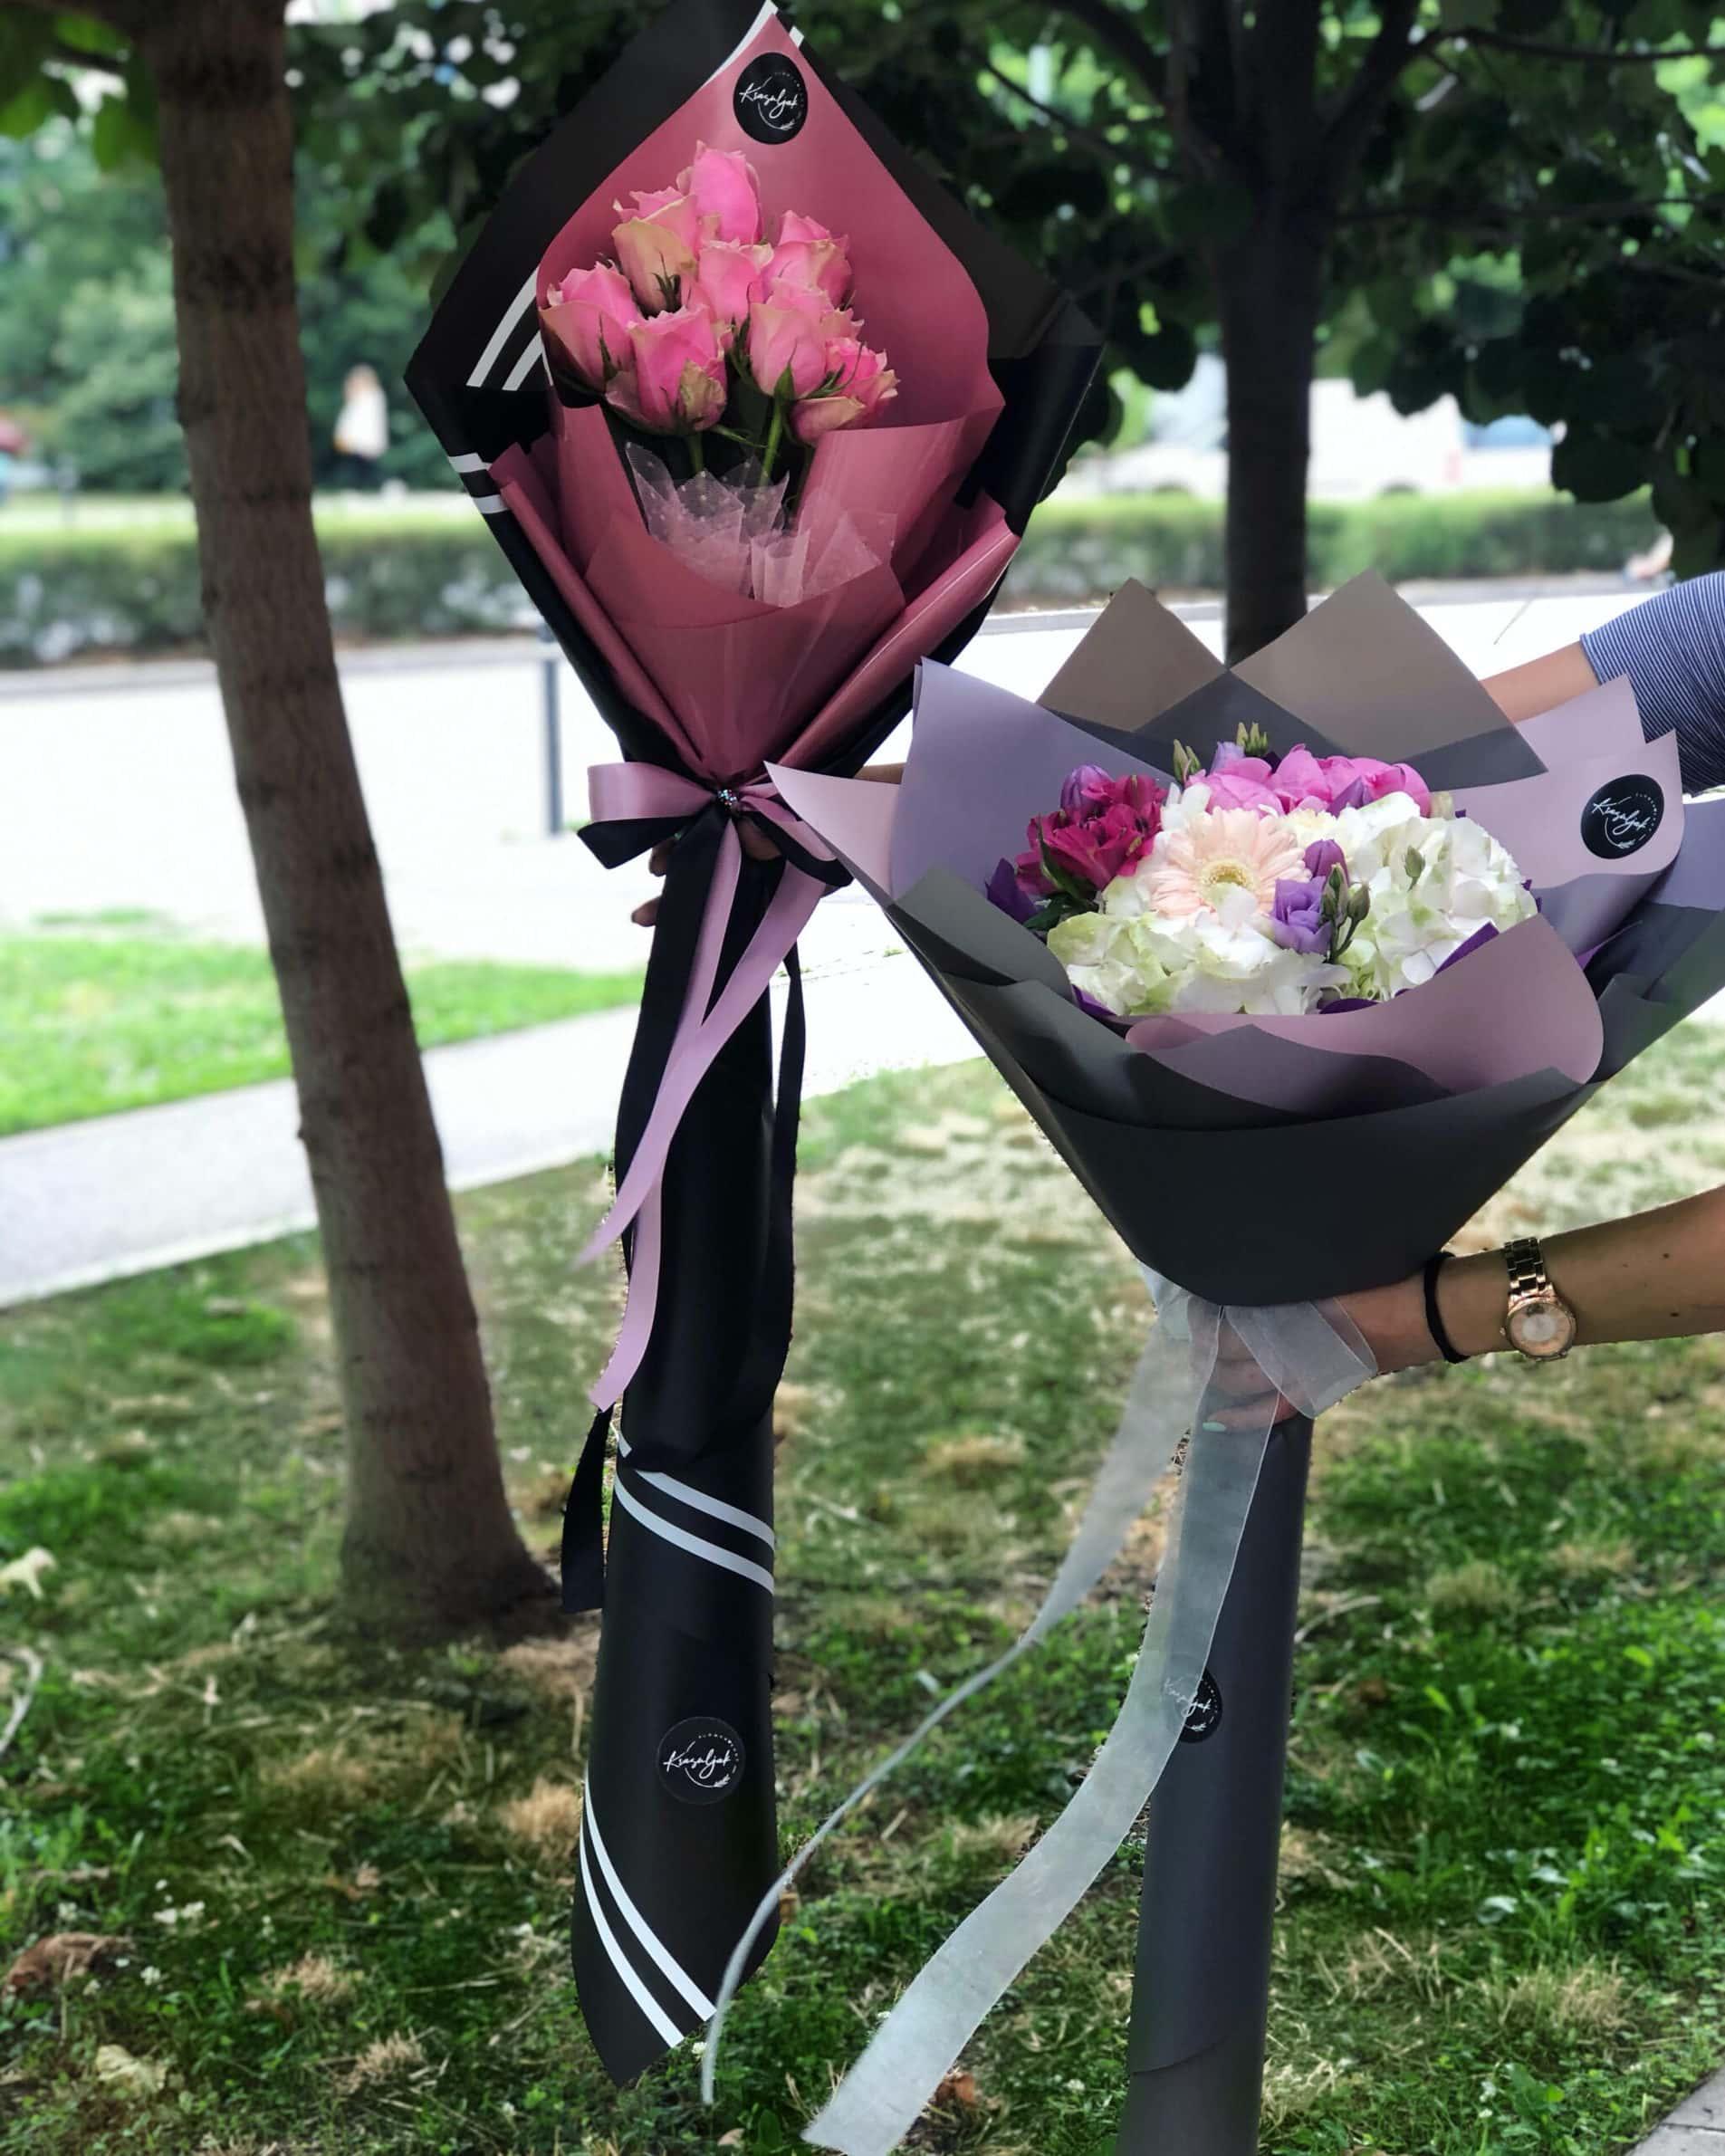 Cveće - buket cveća, crni i sivi papir ukrasni, cvećara